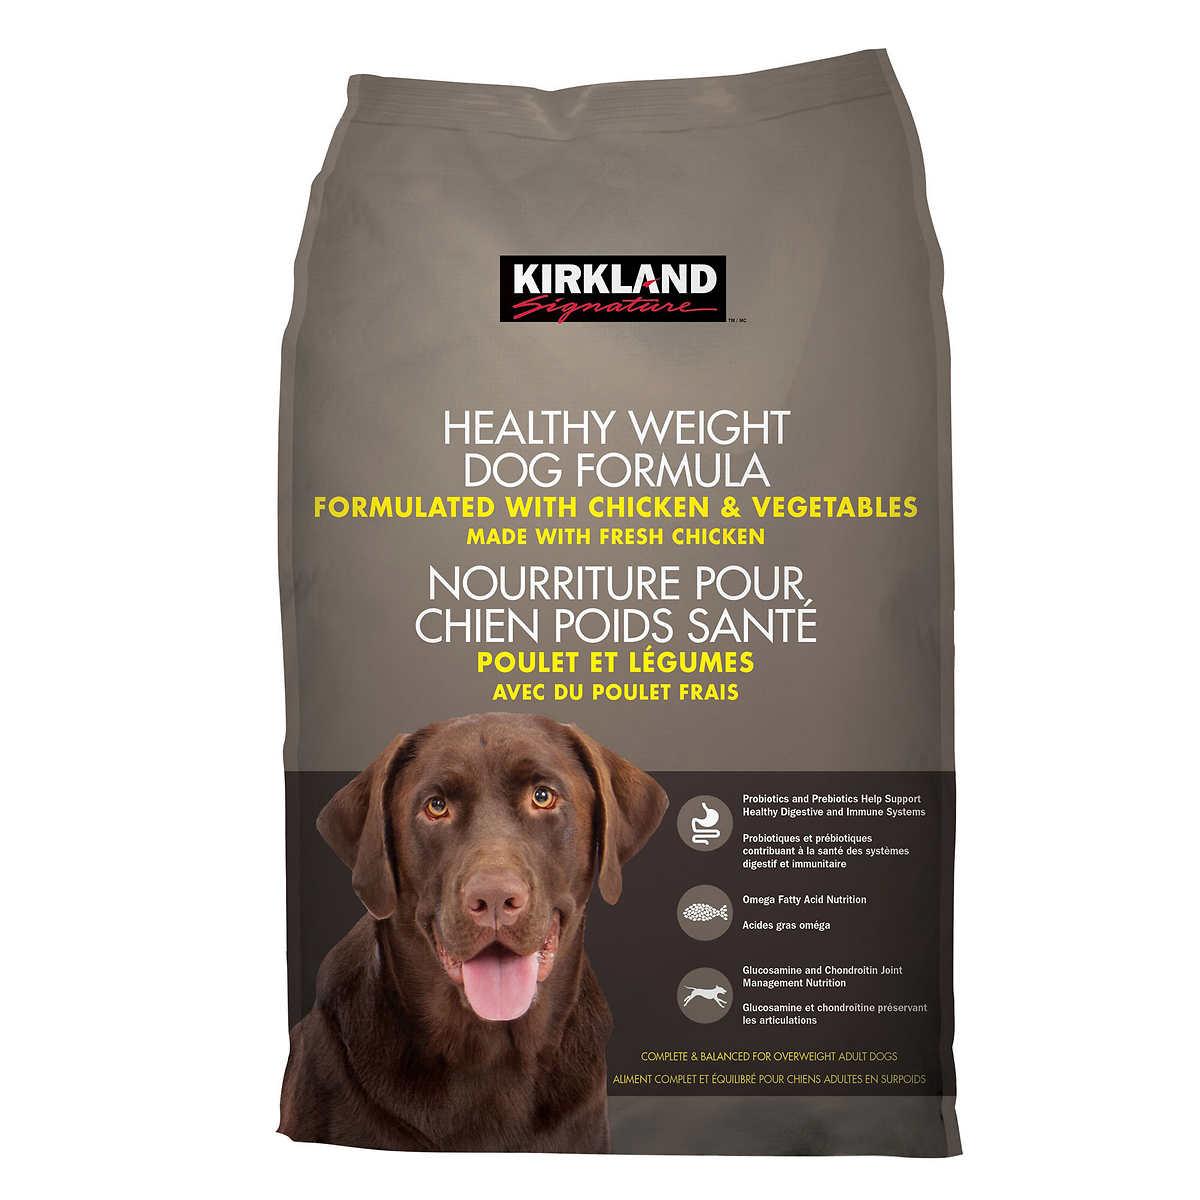 Kirkland Grain Free Dog Food Cost